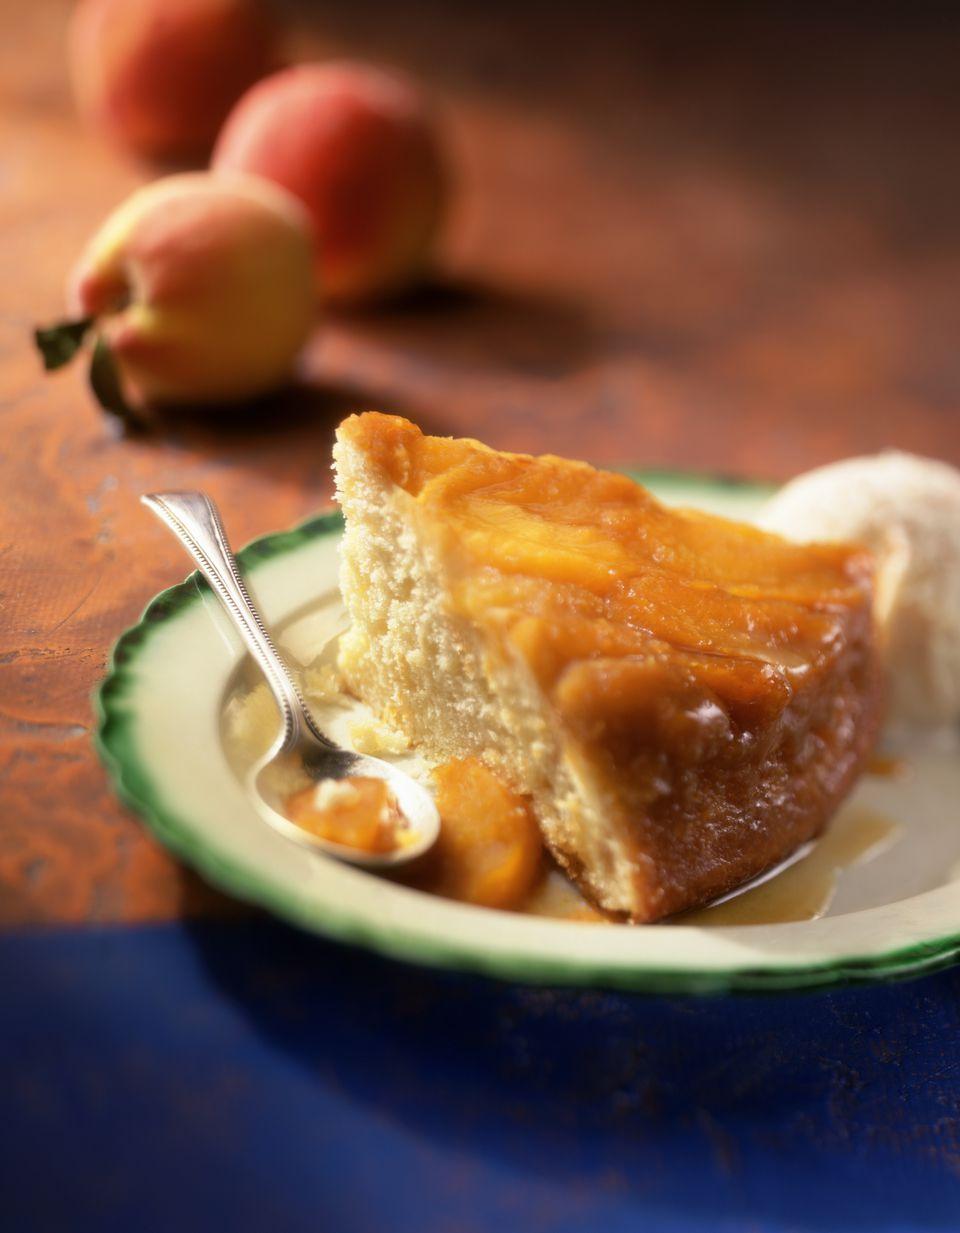 Caramelized Peach Upside Down Cake